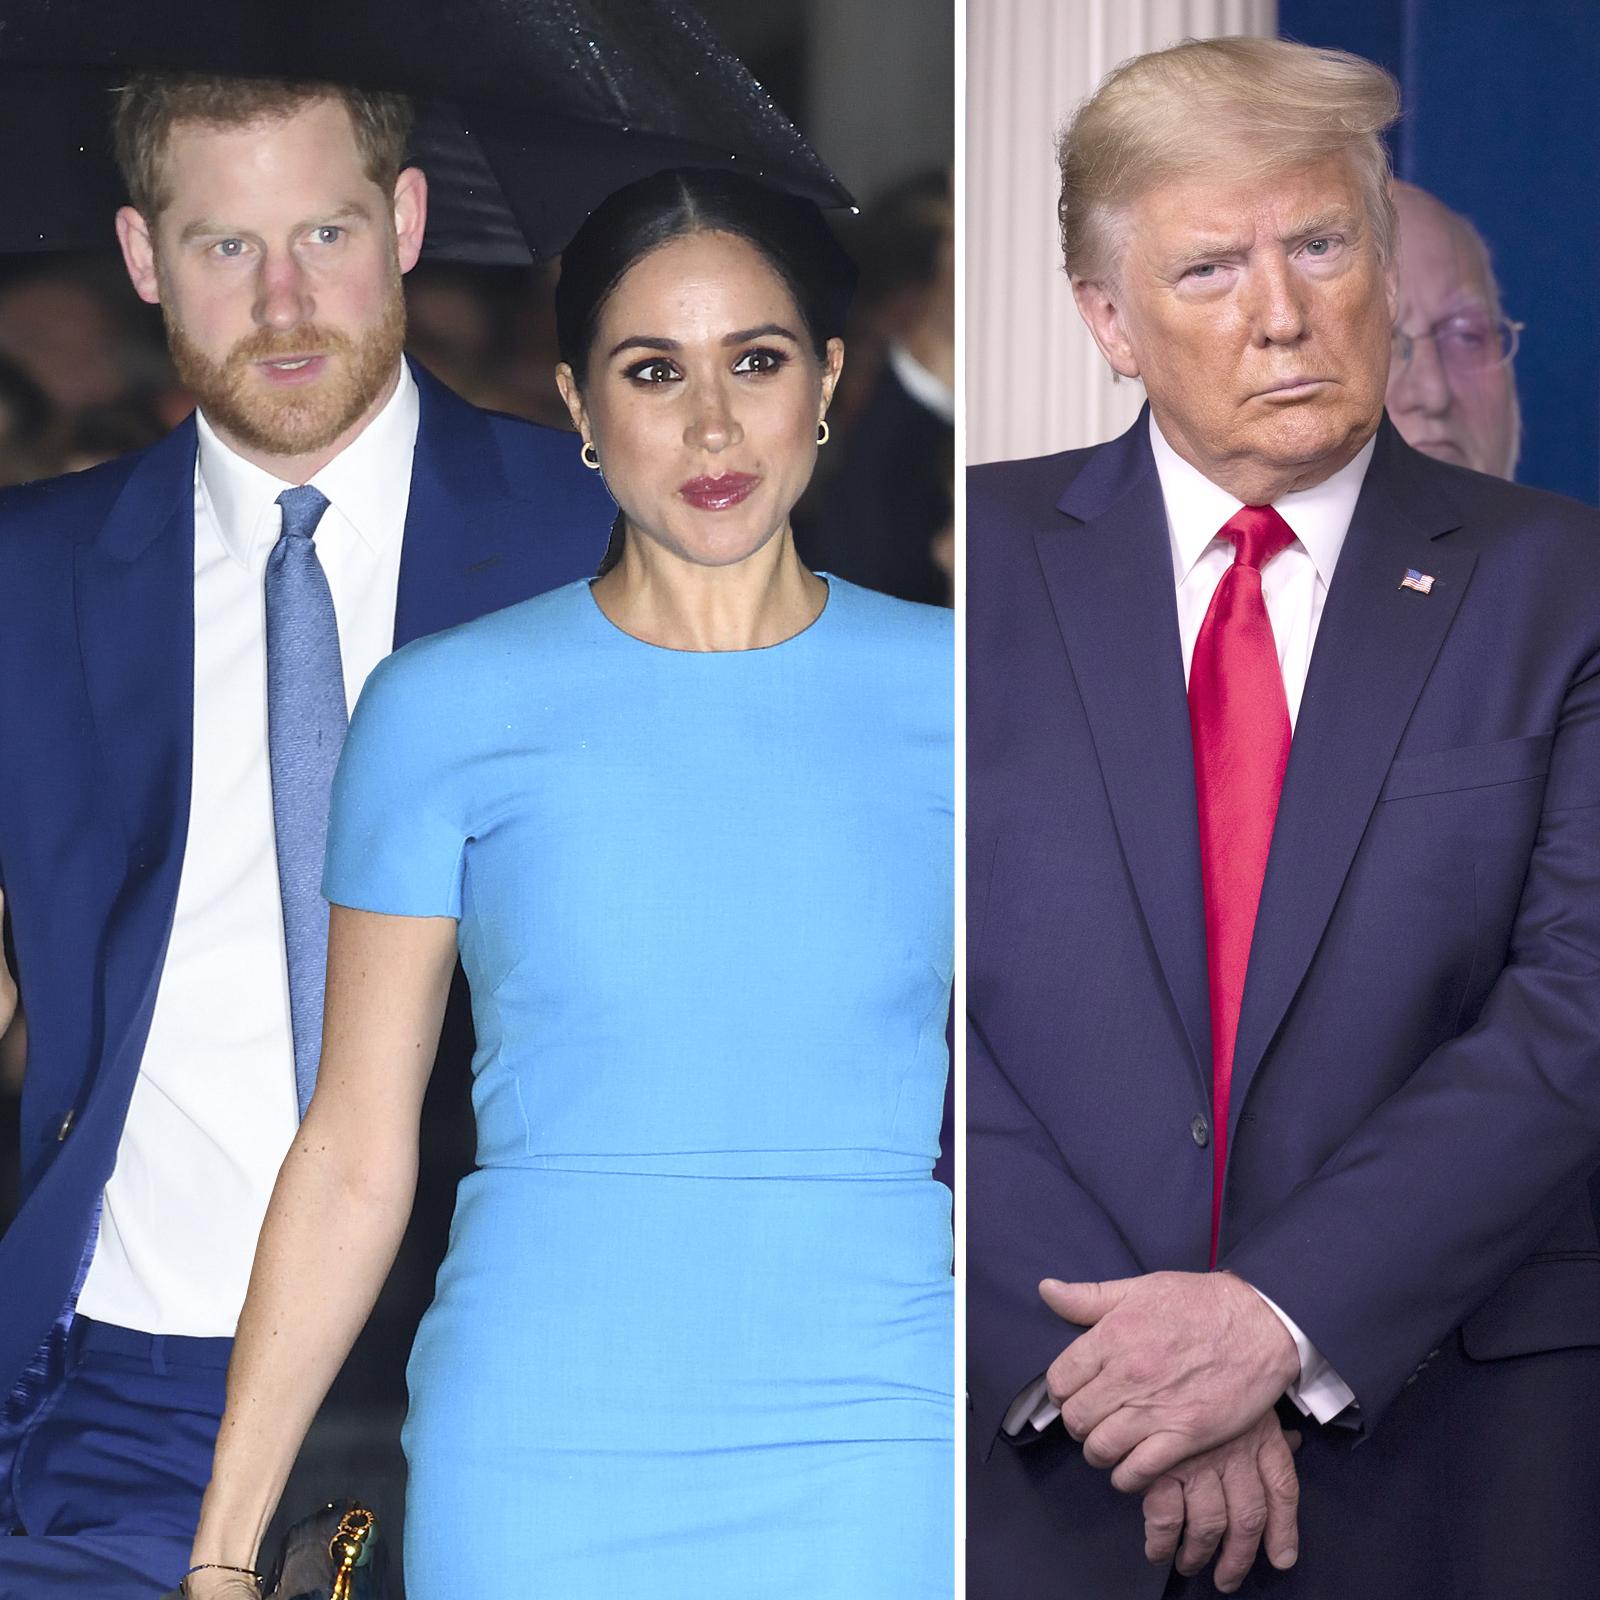 Harry, Meghan y Donald Trump